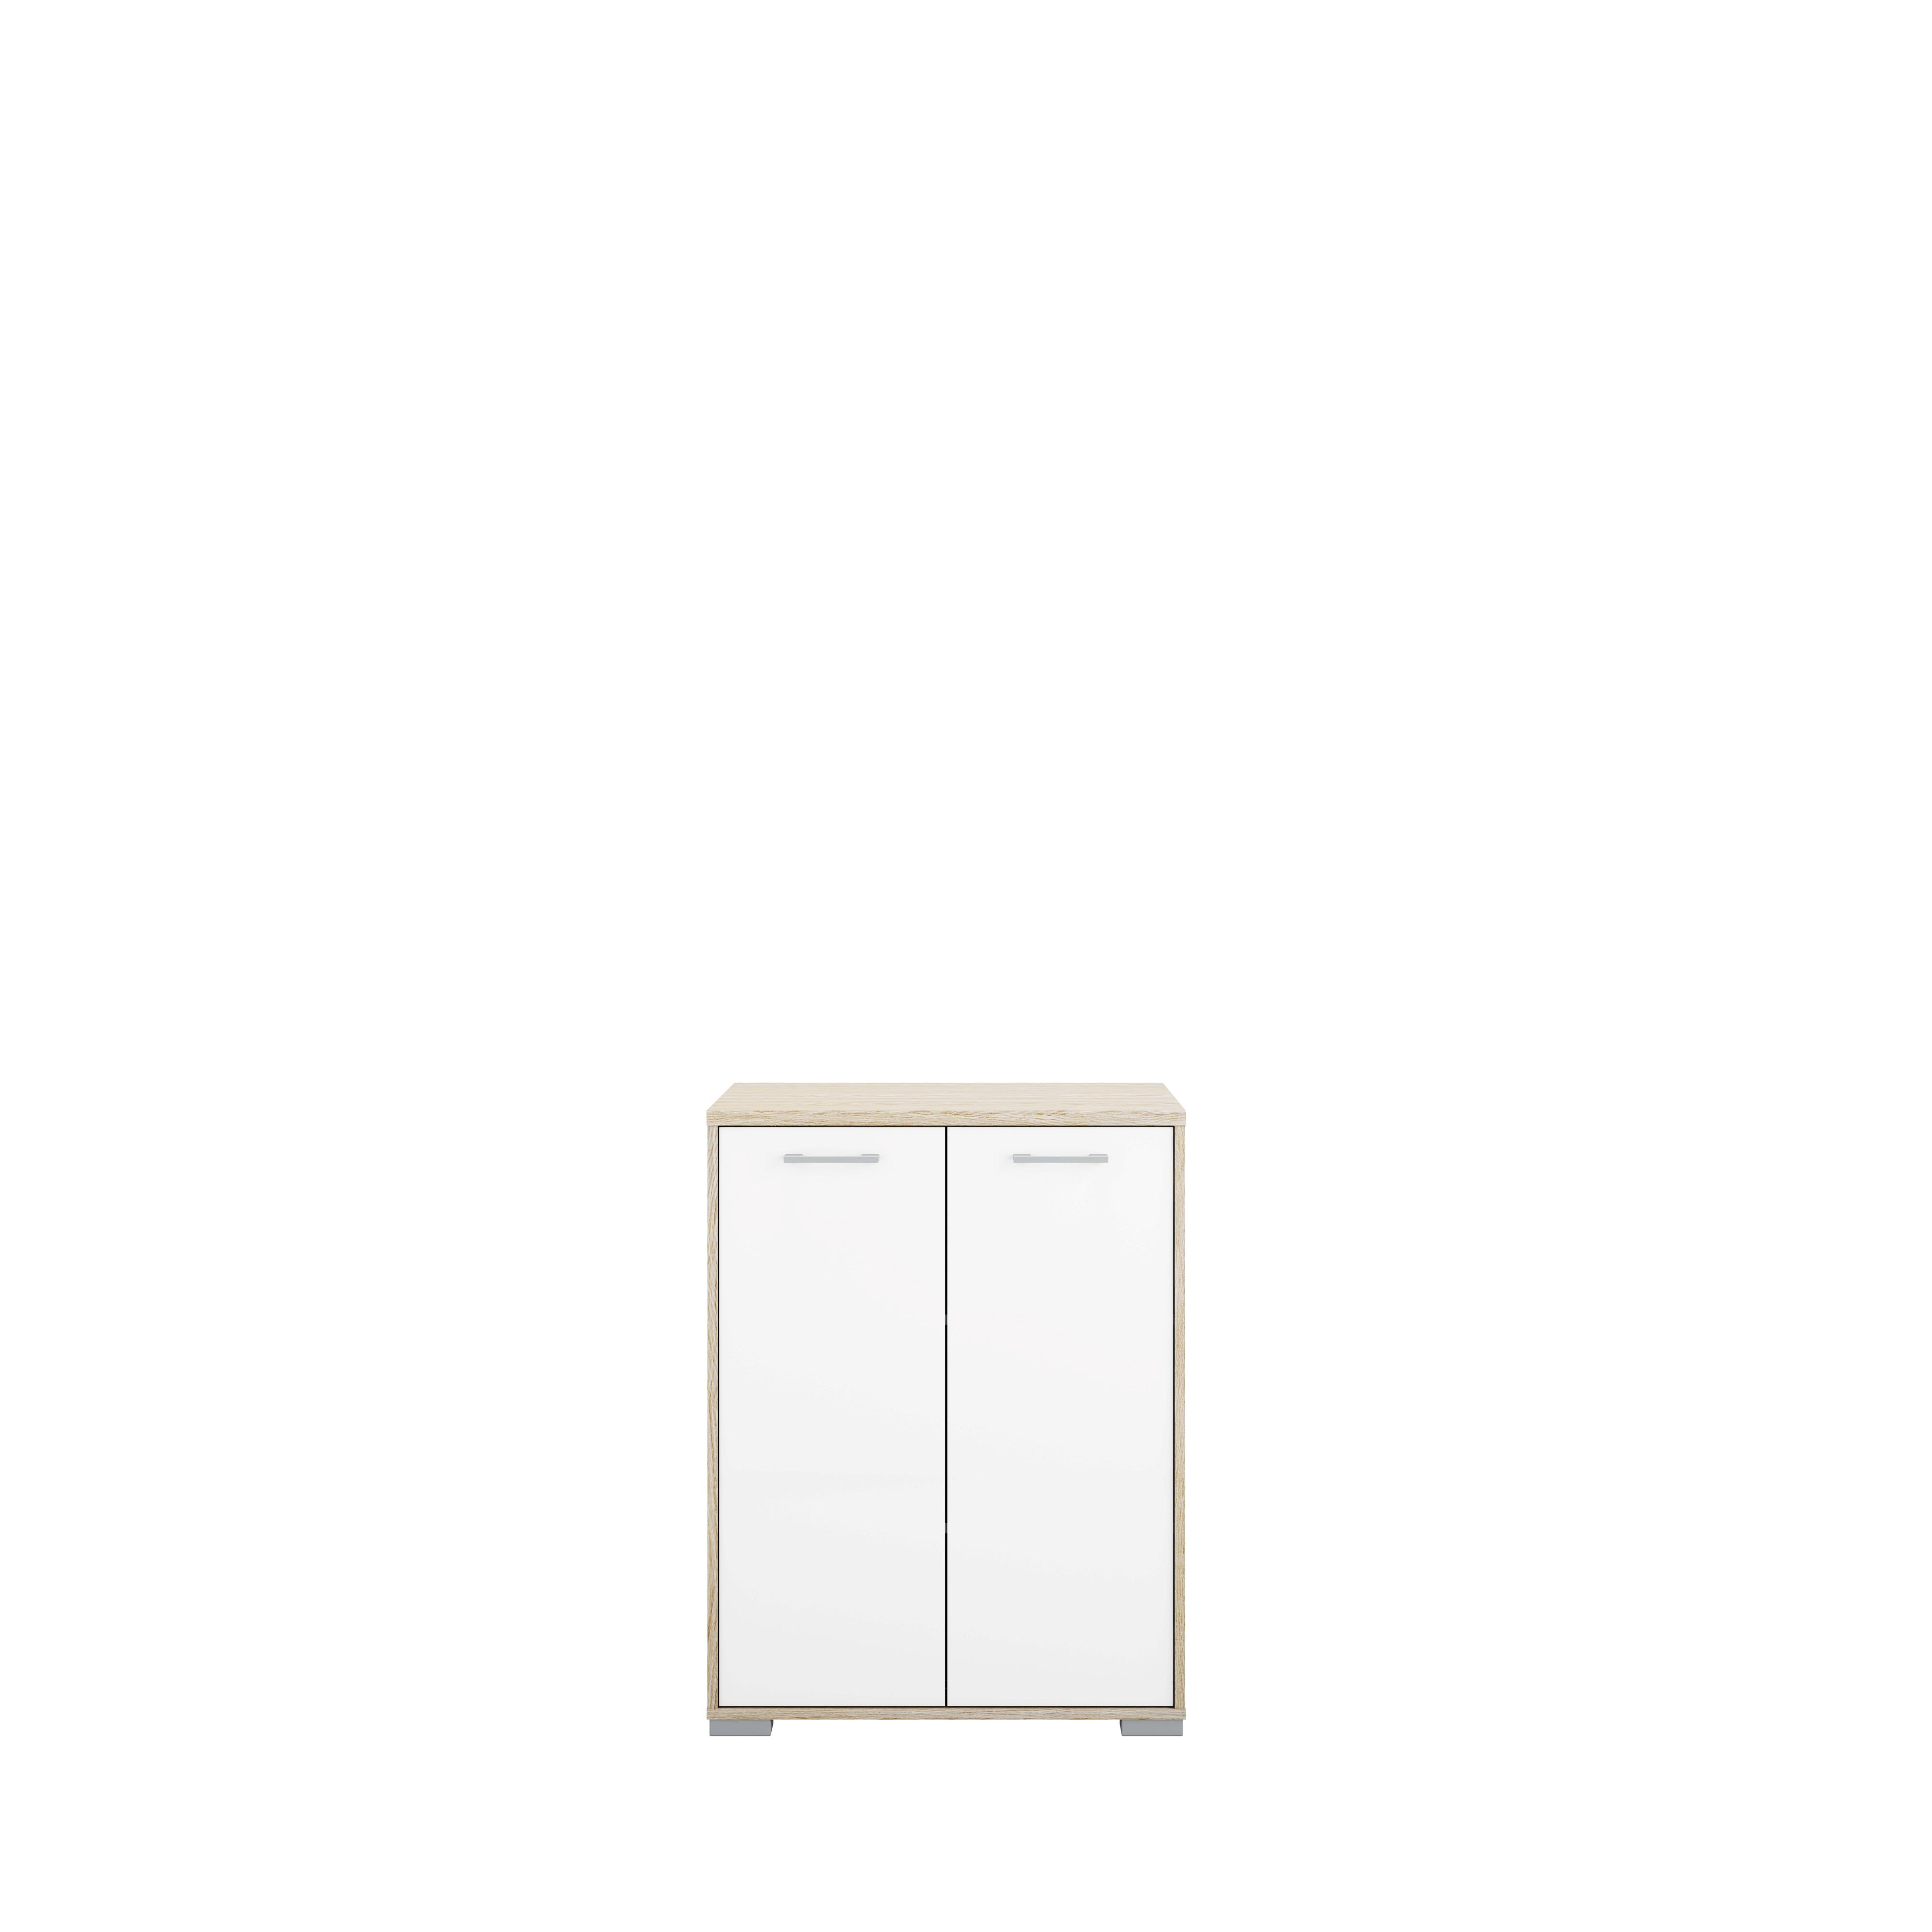 Sknk med 2 lger i eg struktur og hvid hjglans - Homeline dekoration ...